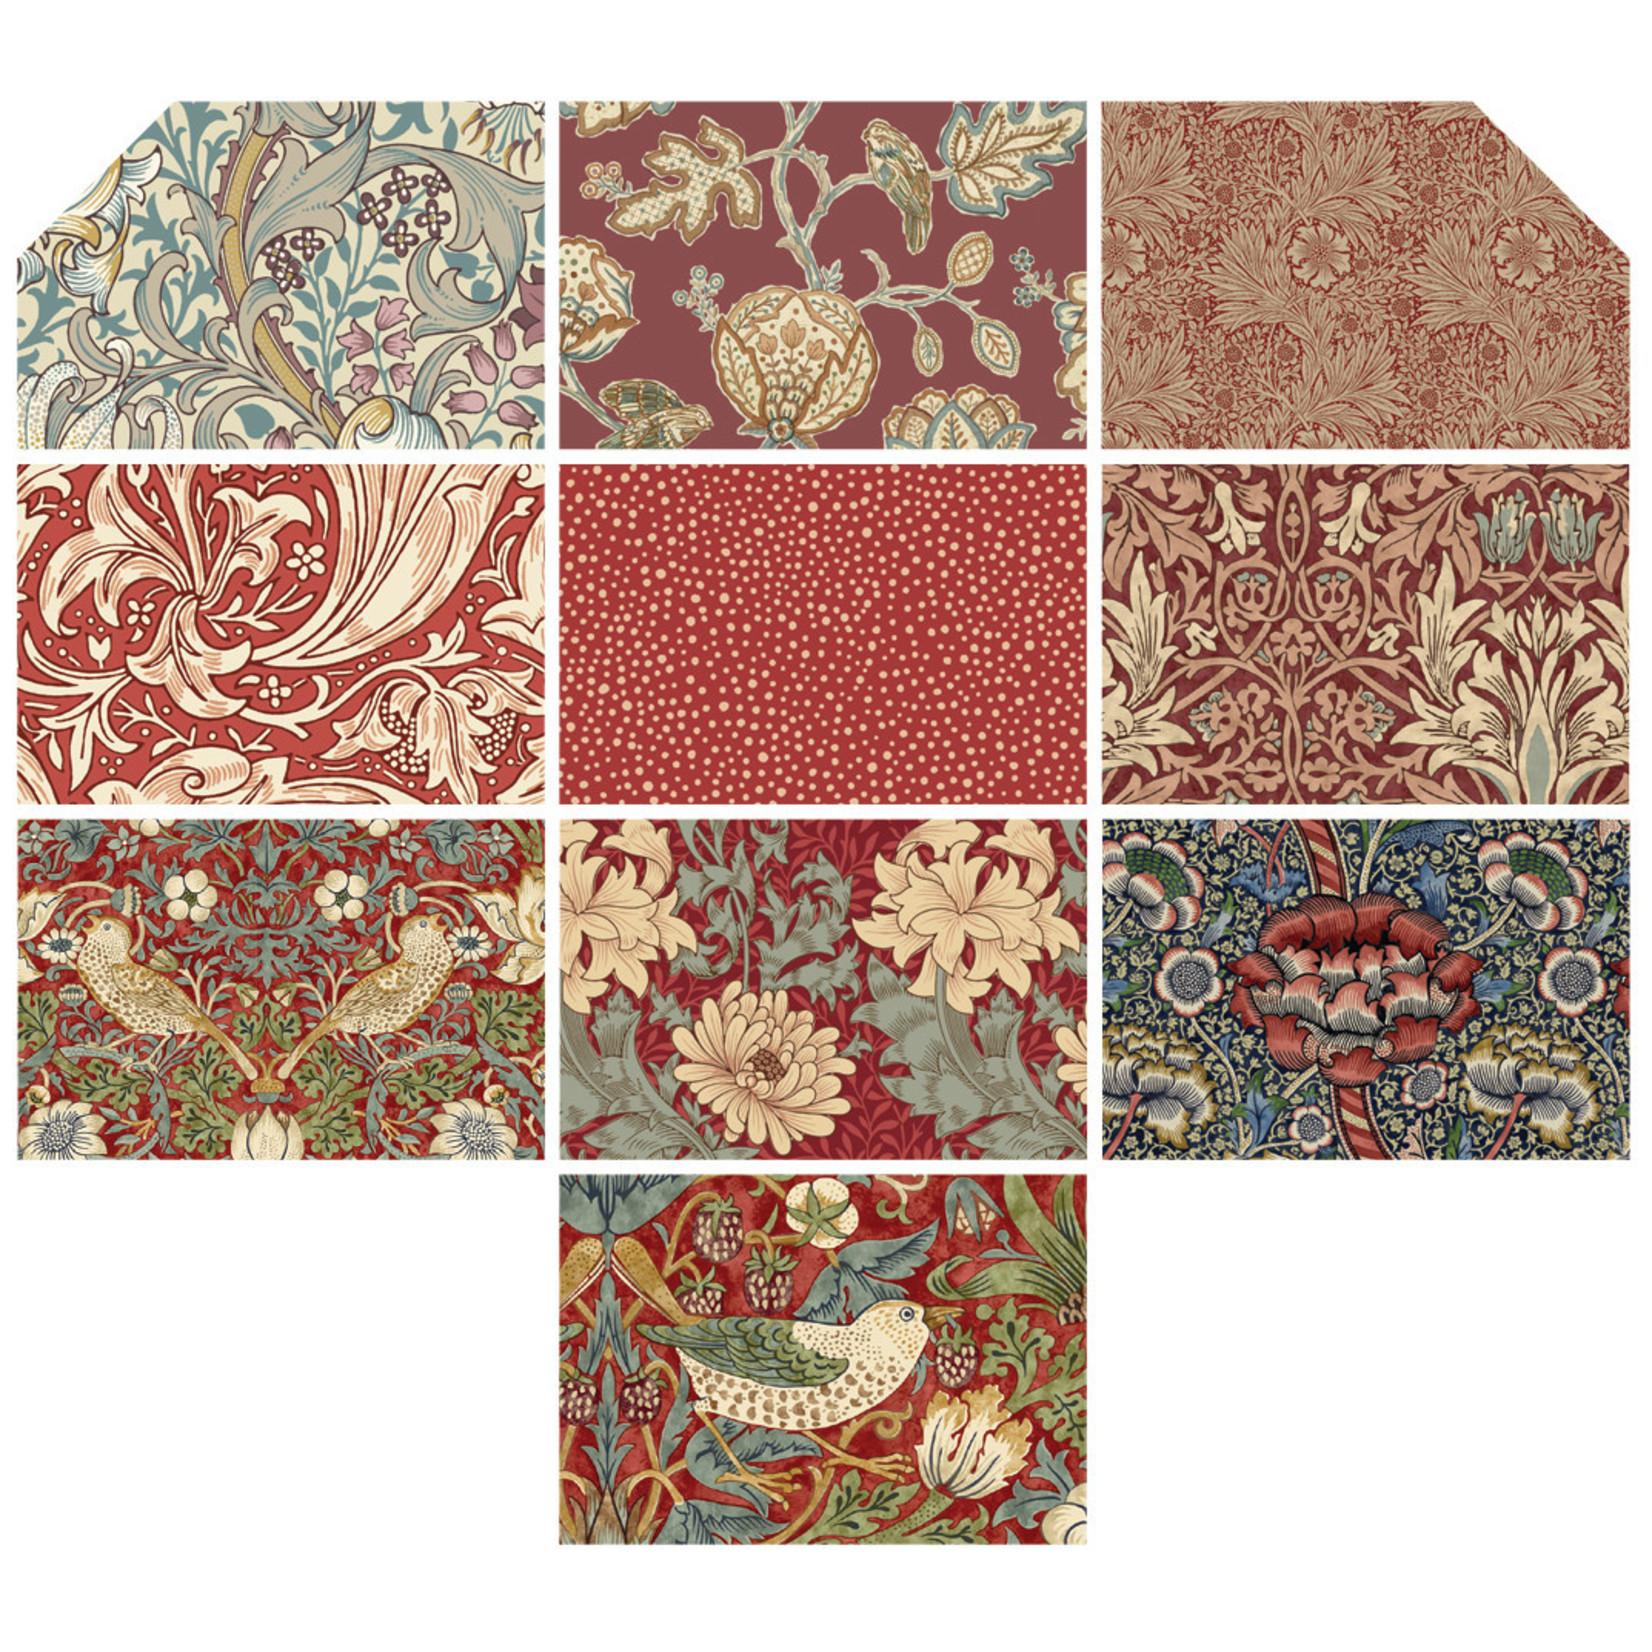 Morris & Co Pre-Order Morris - Fat Quarter - Antique Red (10 pieces)